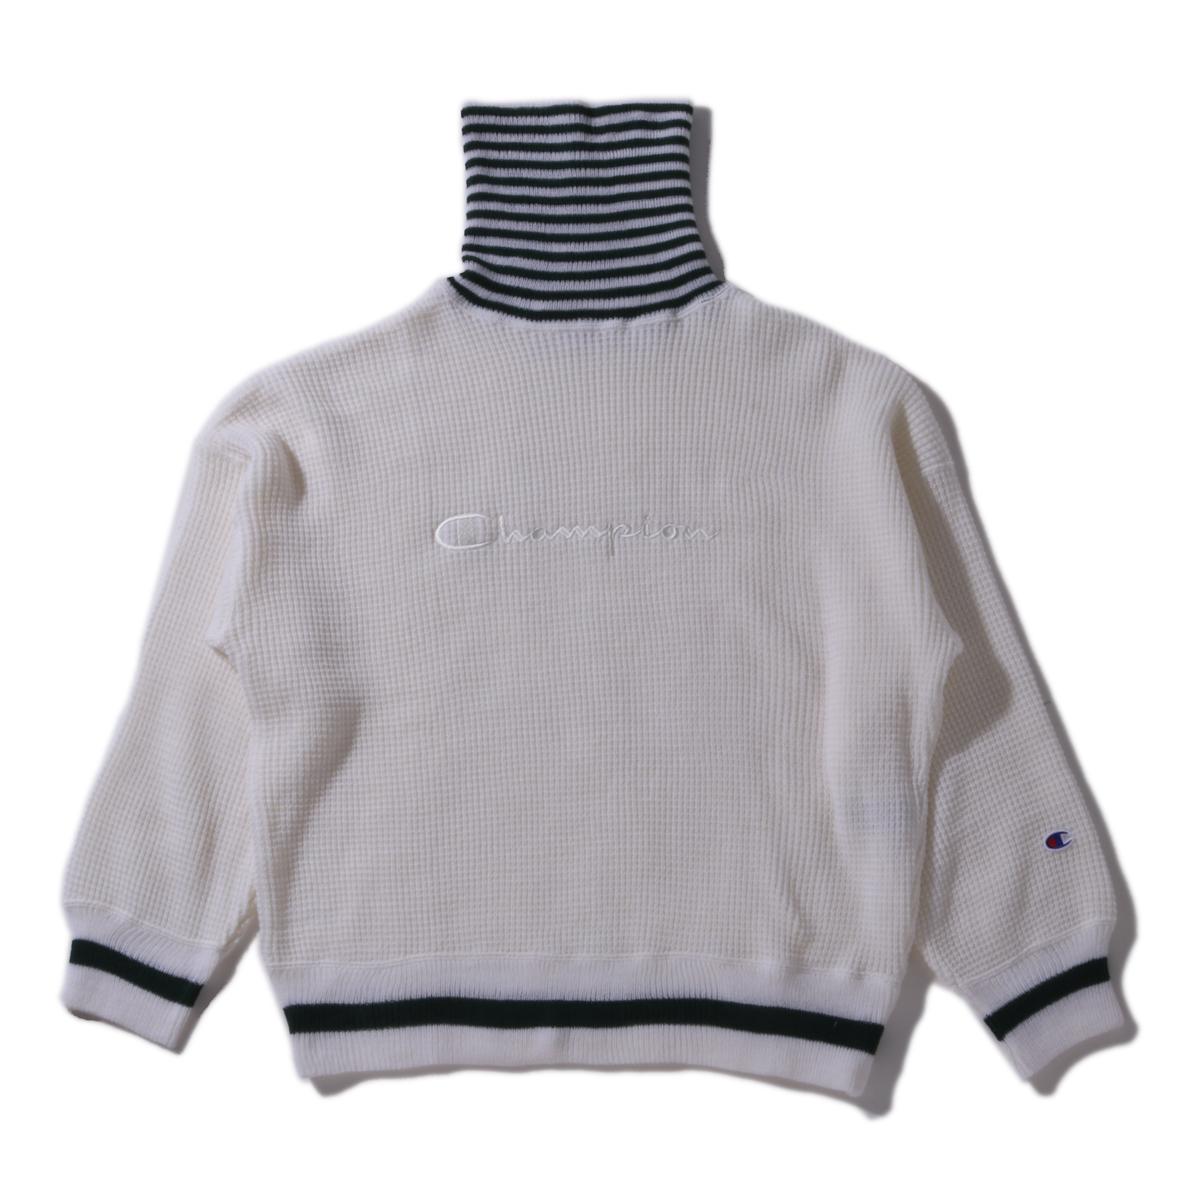 Champion HIGHNECK SHIRT(チャンピオン ハイネック シャツ)オフホワイト【レディース 長袖Tシャツ】19FA-I